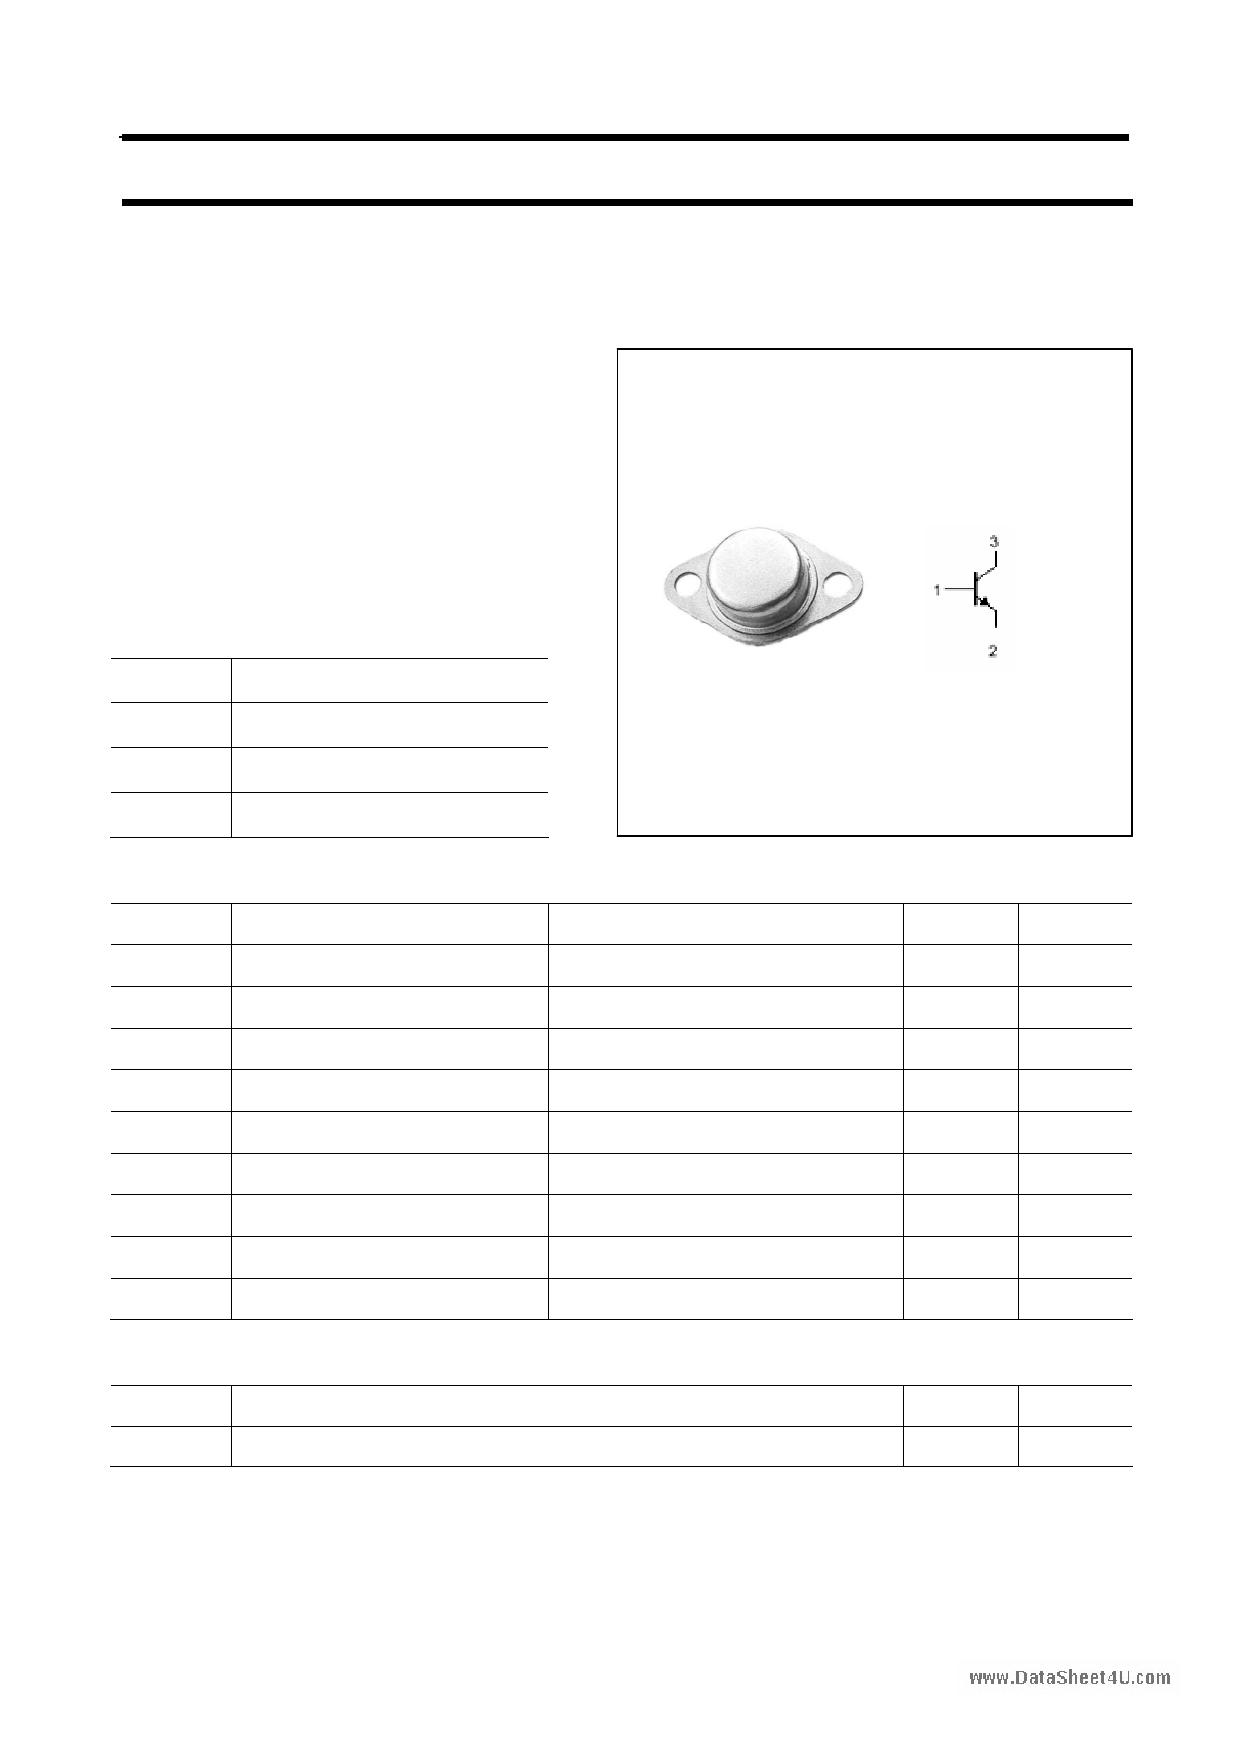 2N3585 datasheet